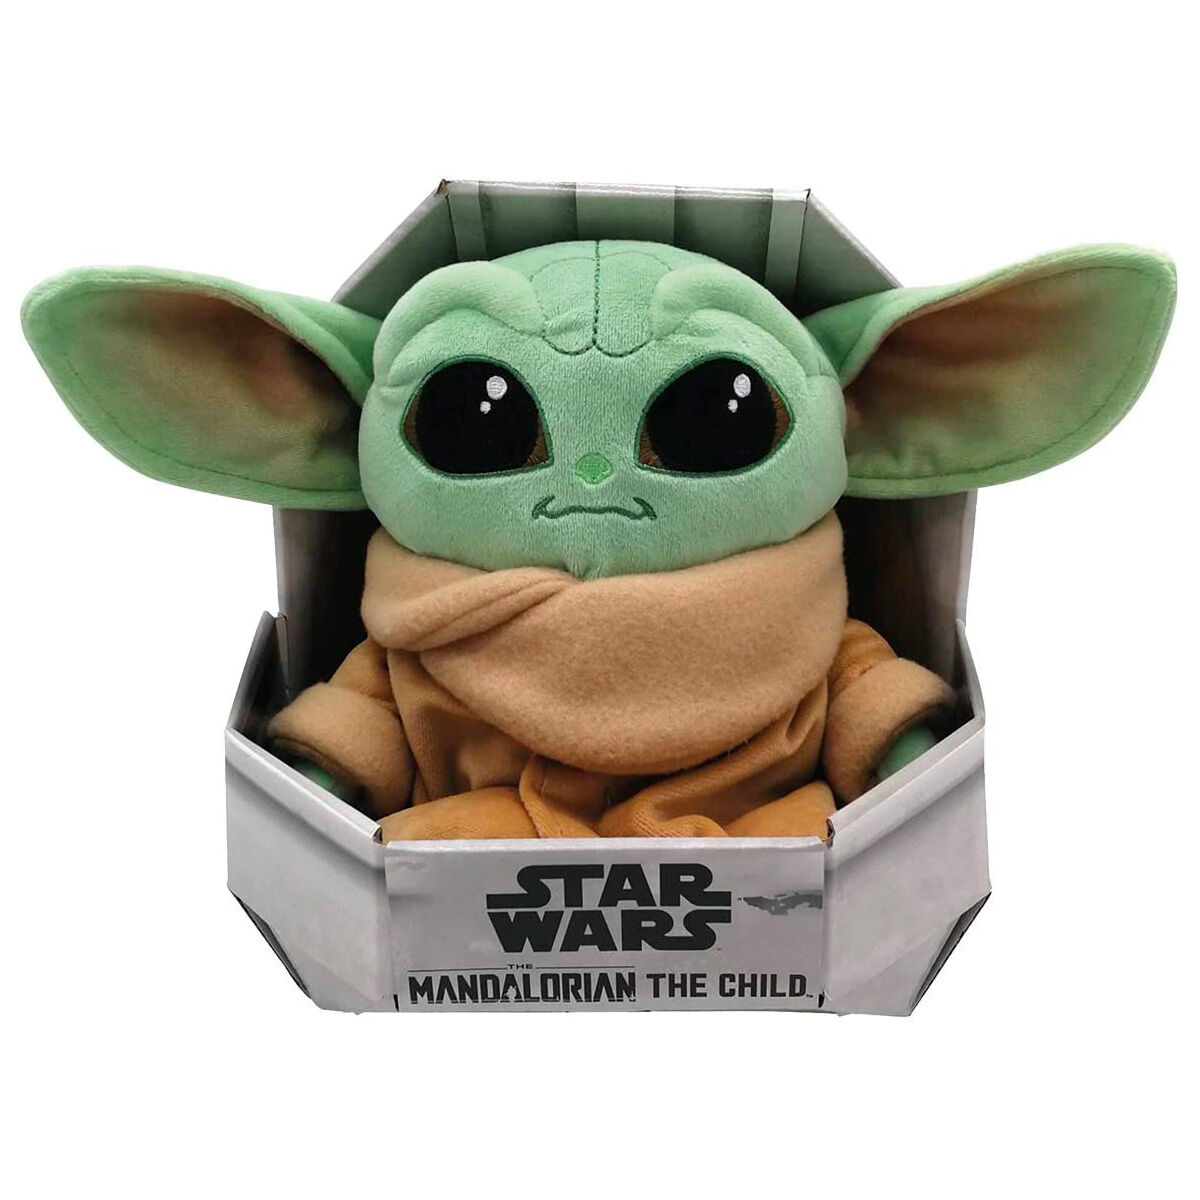 Peluche The Child Baby Yoda The Mandalorian Star Wars 25cm 5400868008784